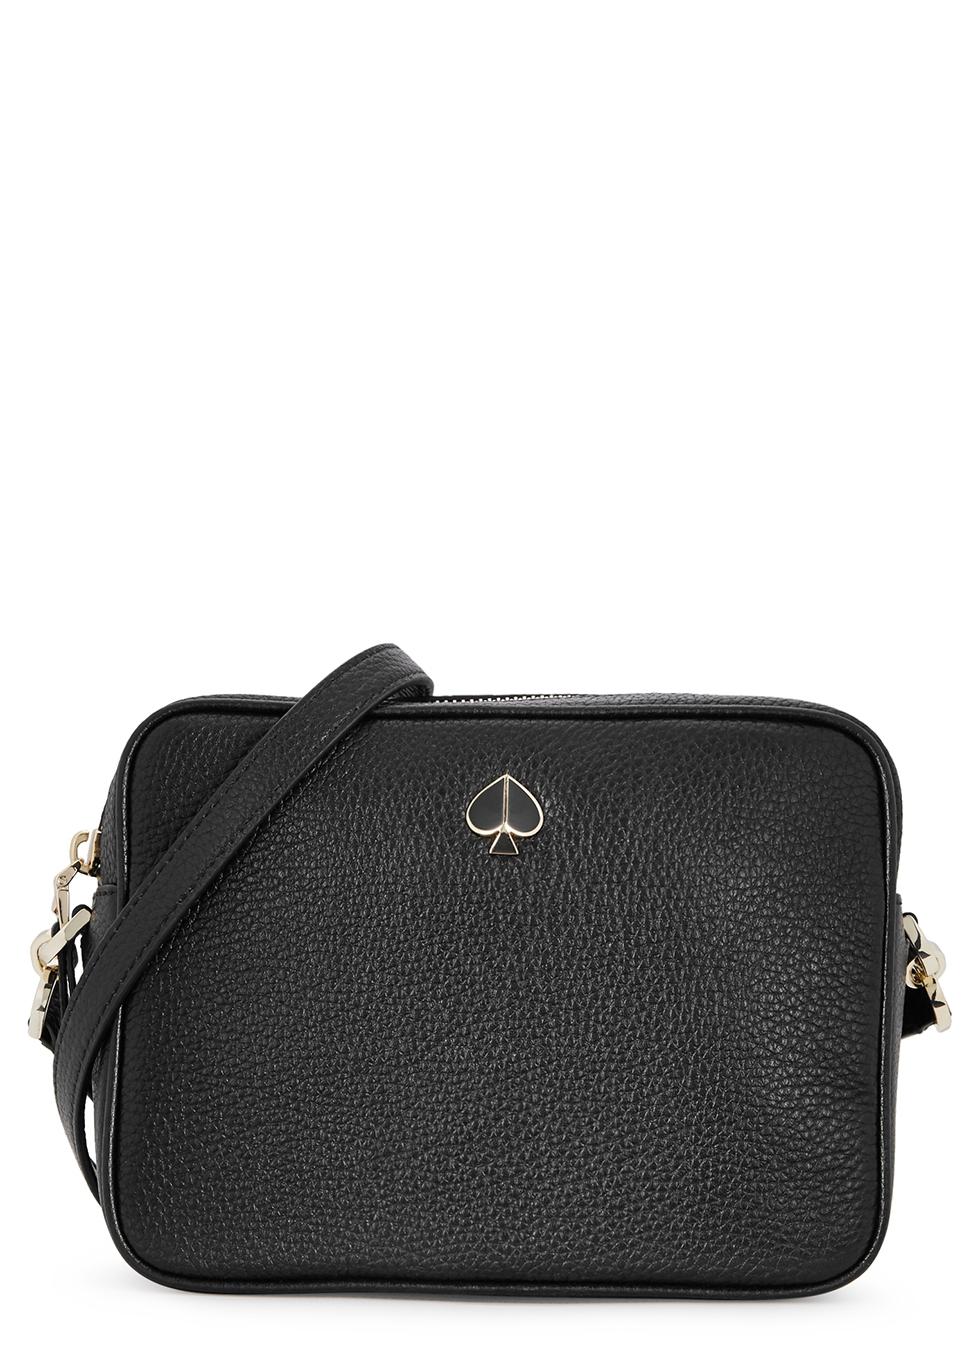 Polly medium leather camera bag - Kate Spade New York